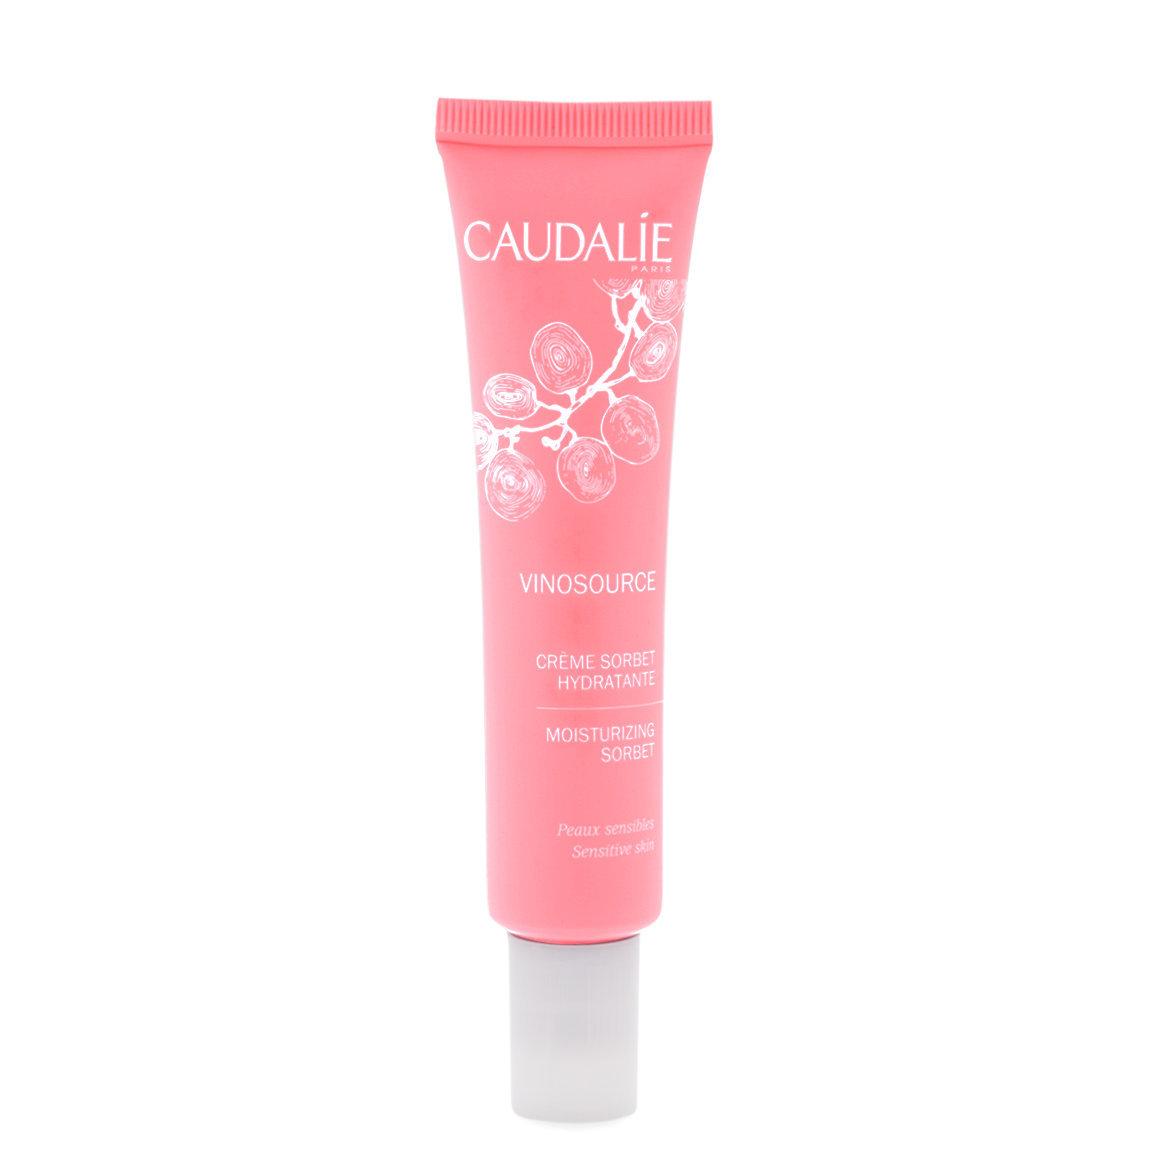 Caudalie Vinosource Moisturizing Sorbet Cream alternative view 1 - product swatch.